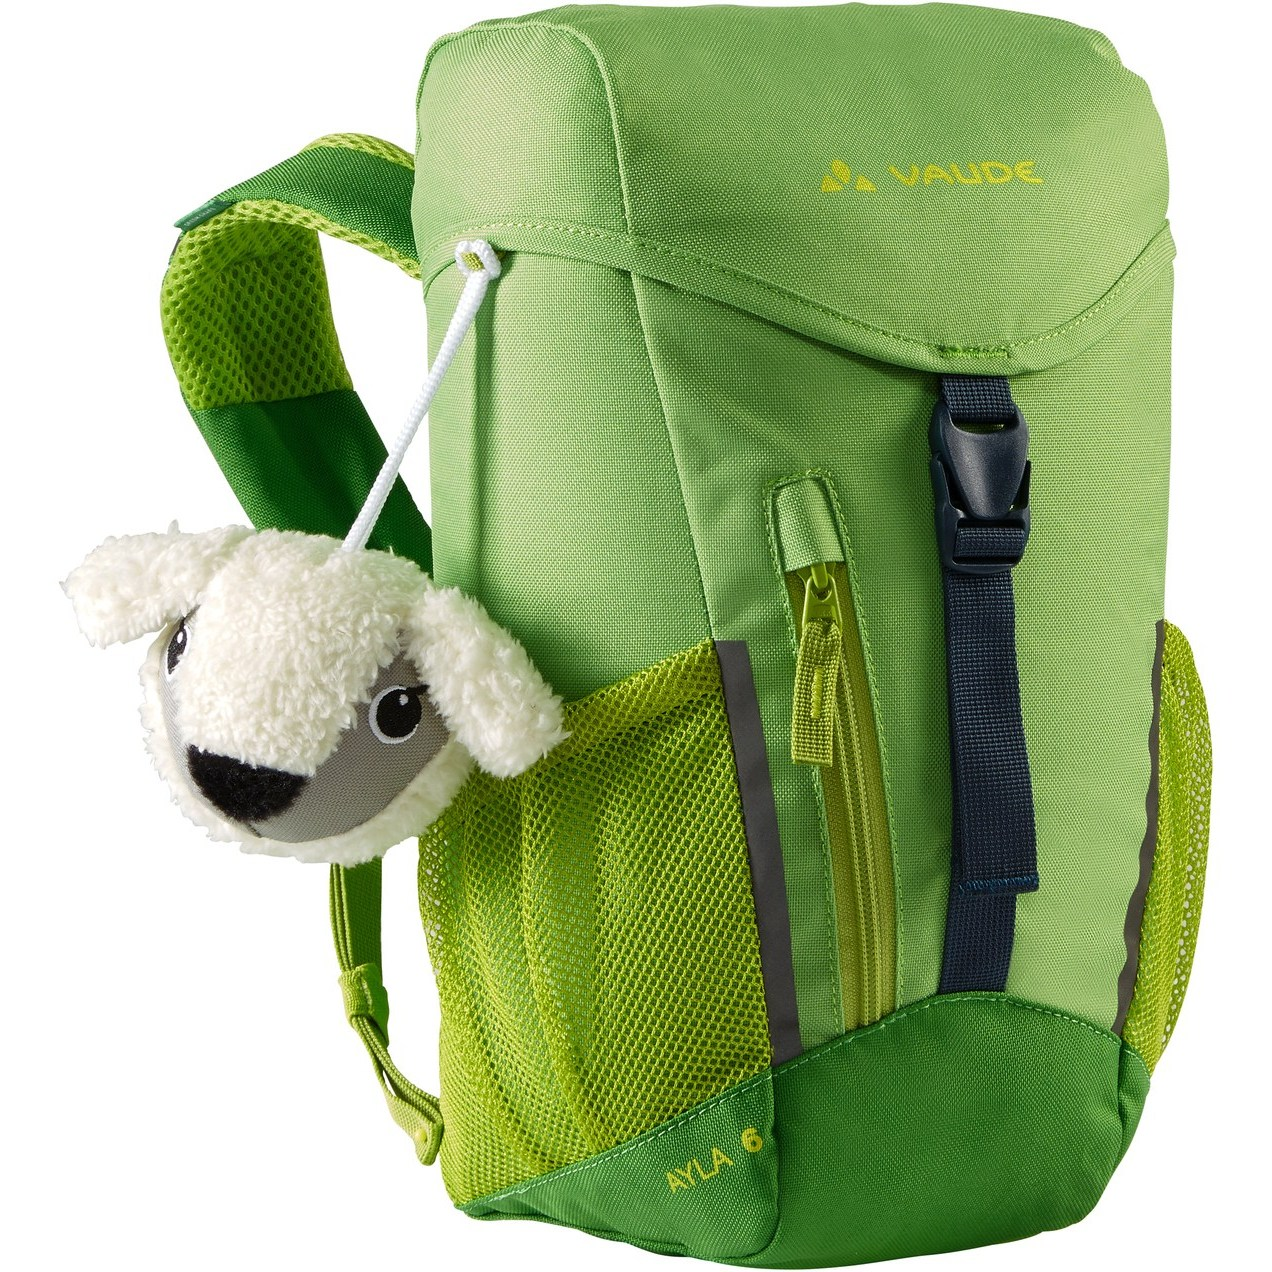 Image of Vaude Ayla 6 Kids Backpack - apple